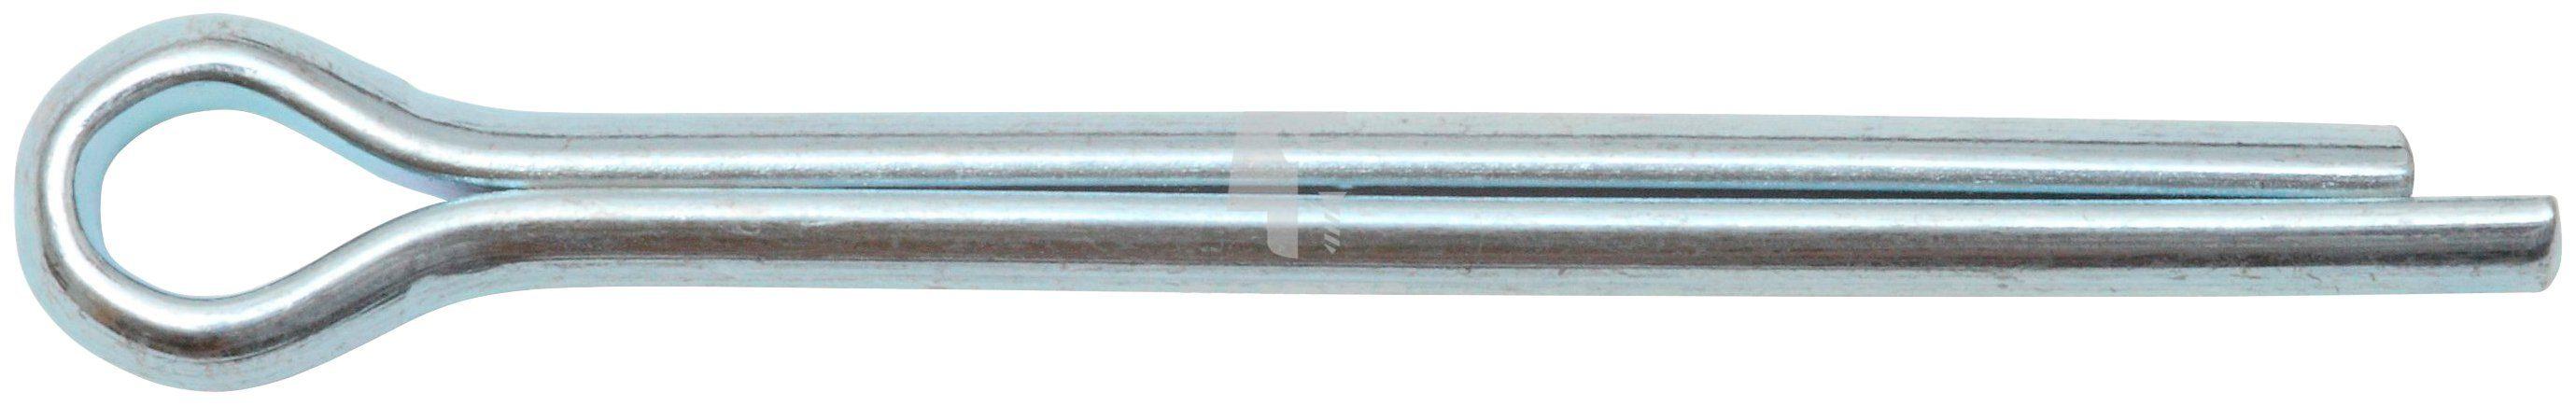 RAMSES Splint , DIN 94 4 x 50 mm Stahl verzinkt 100 Stück